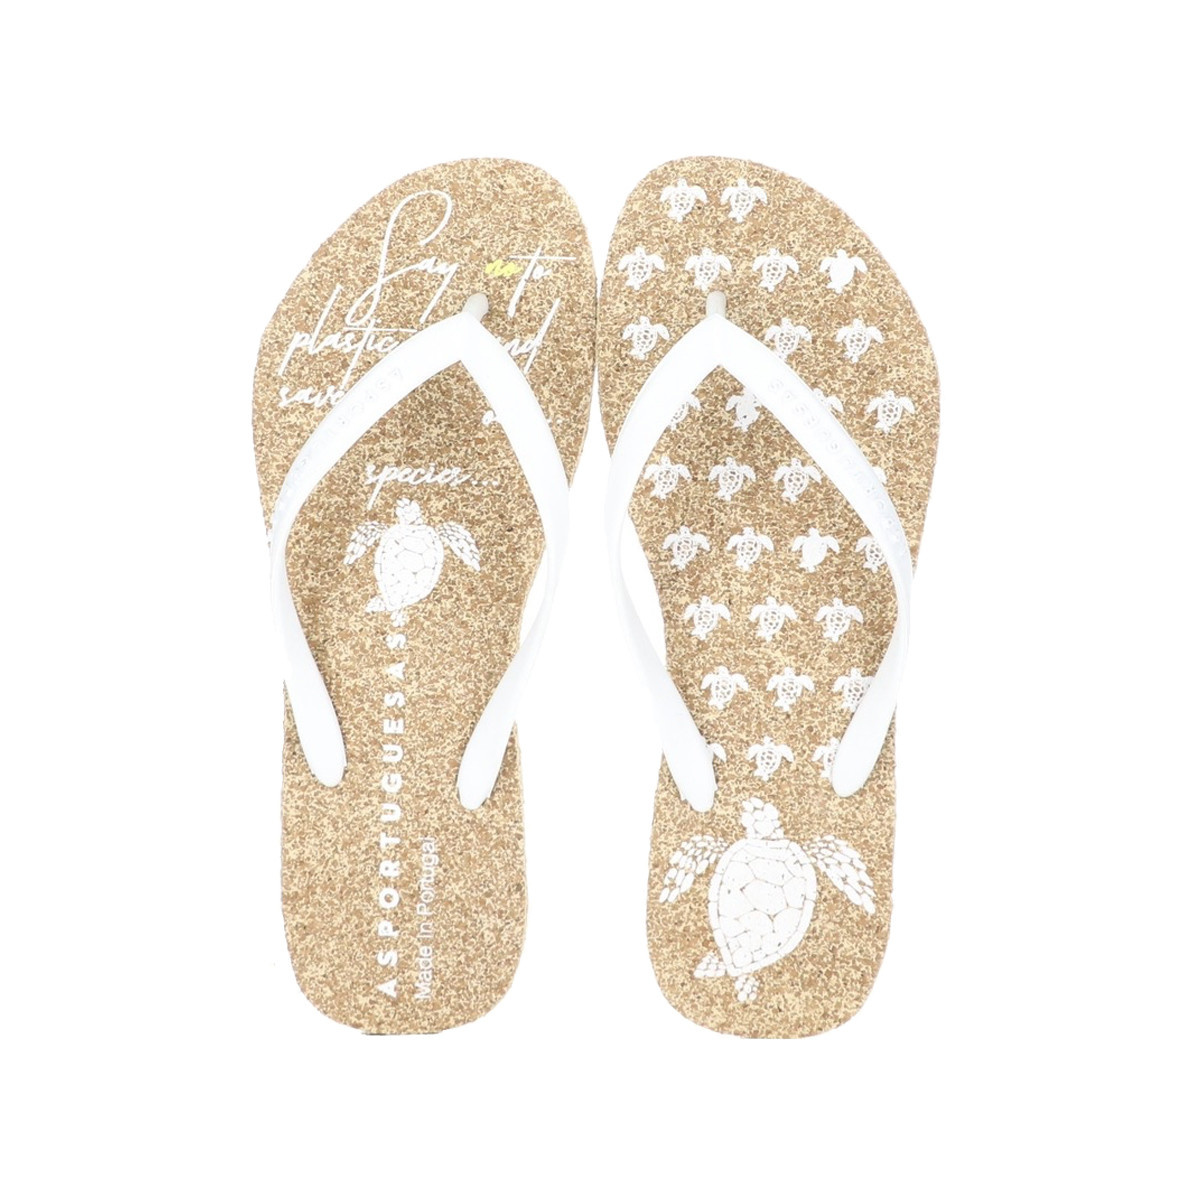 Asportuguesas Asportuegusas Flip Flop Natural / White